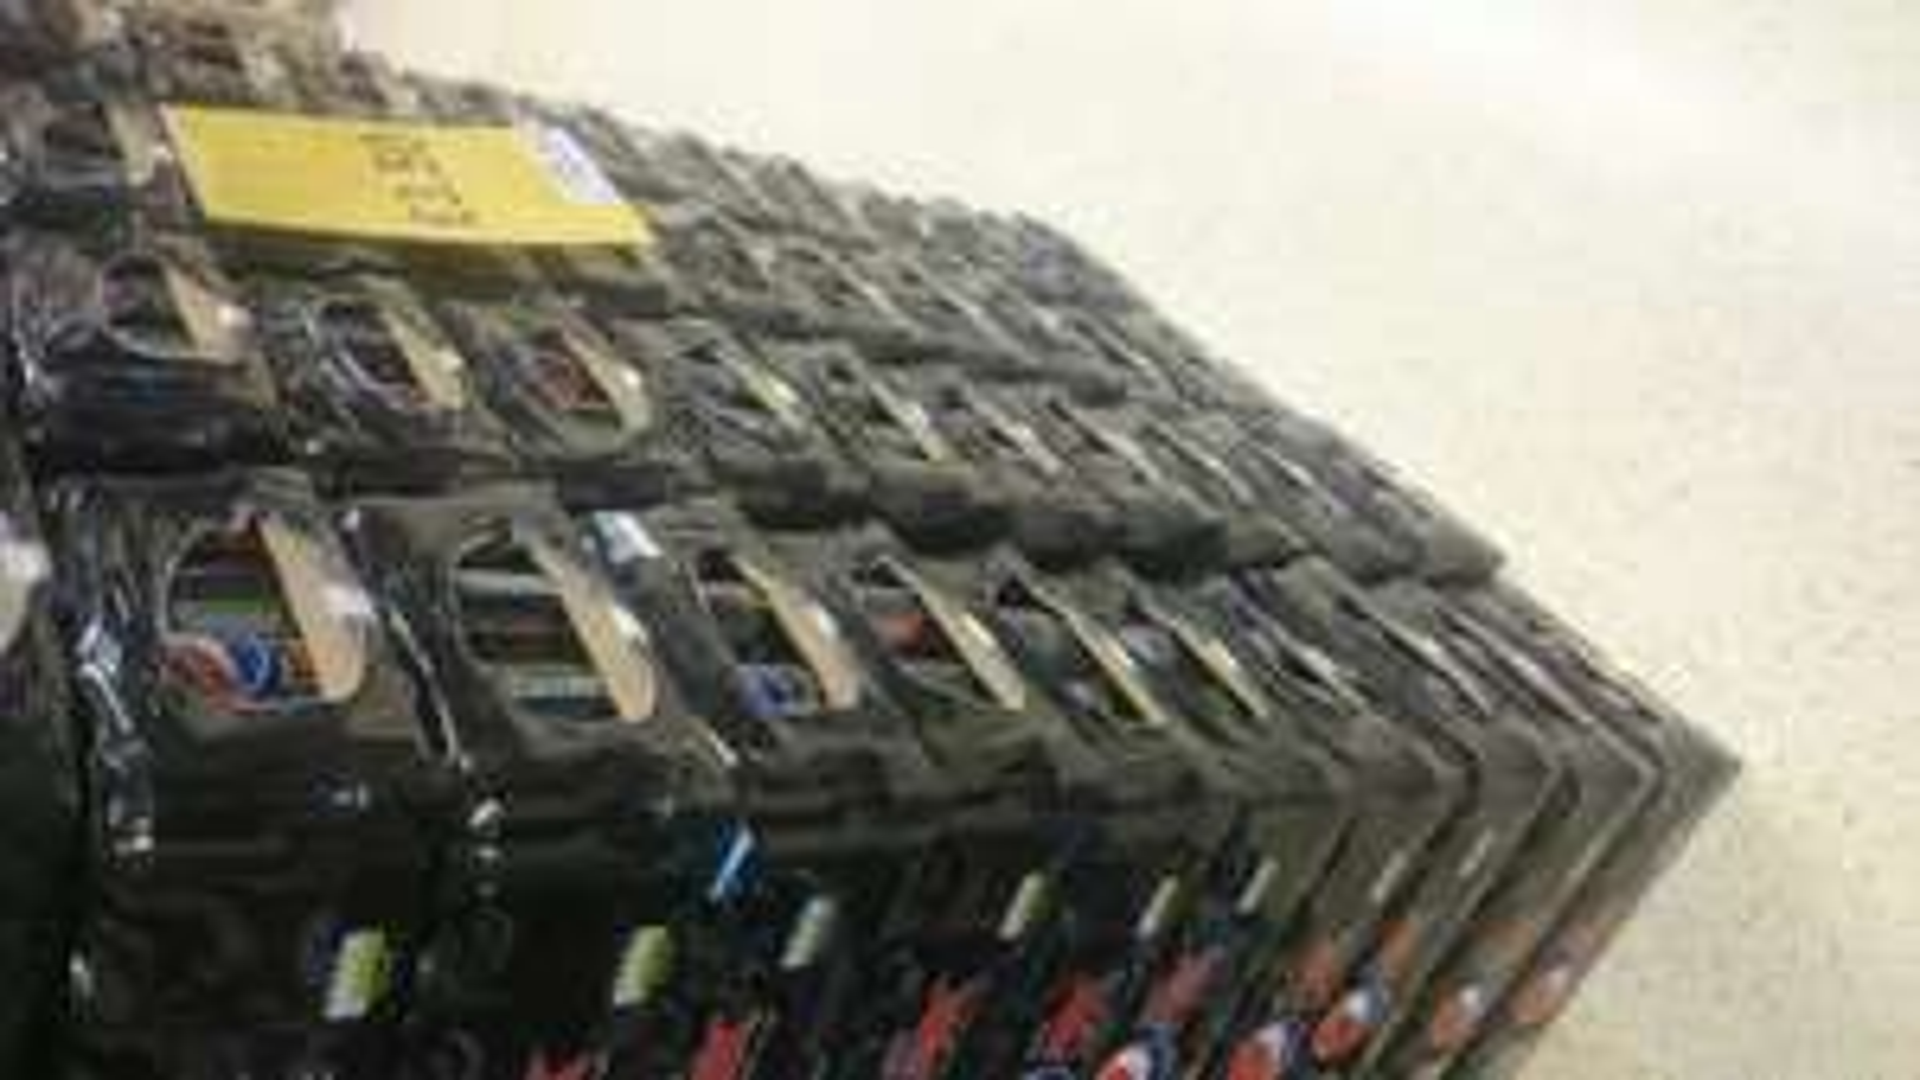 24 cans of Pepsi max £3.50 @ London Bridge Tescos